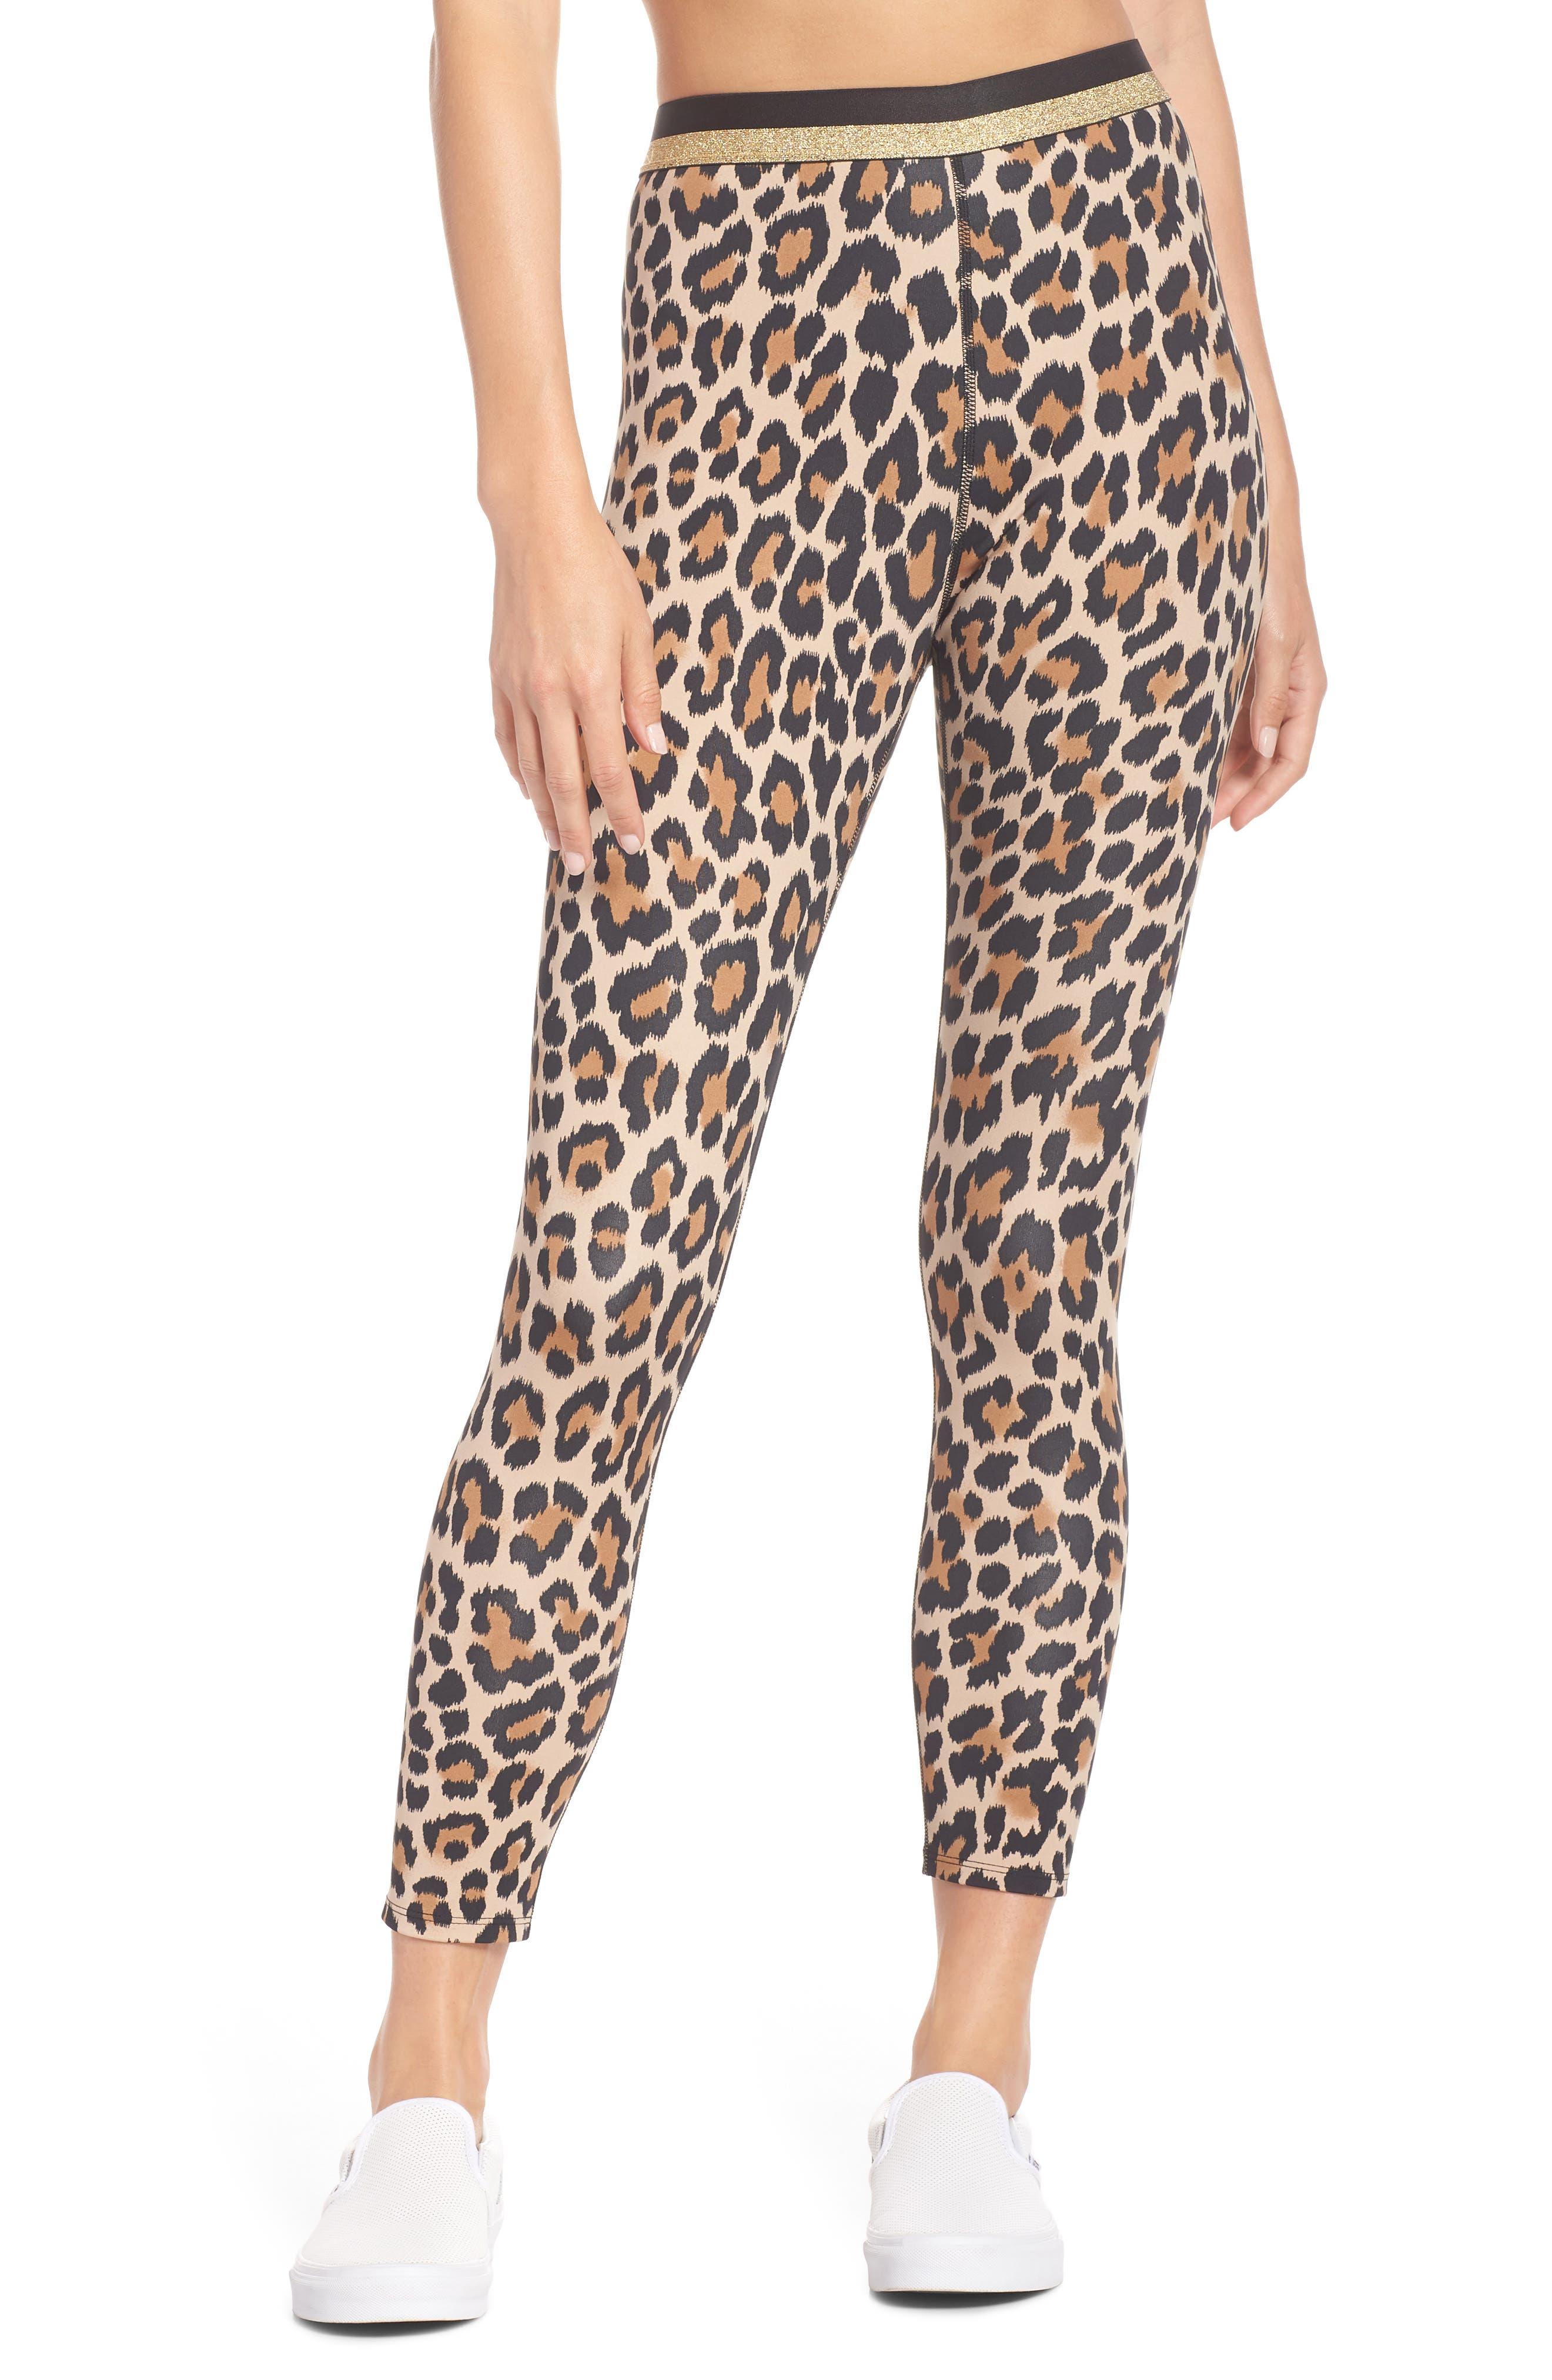 Kate Spade New York Leopard Print Leggings, Beige